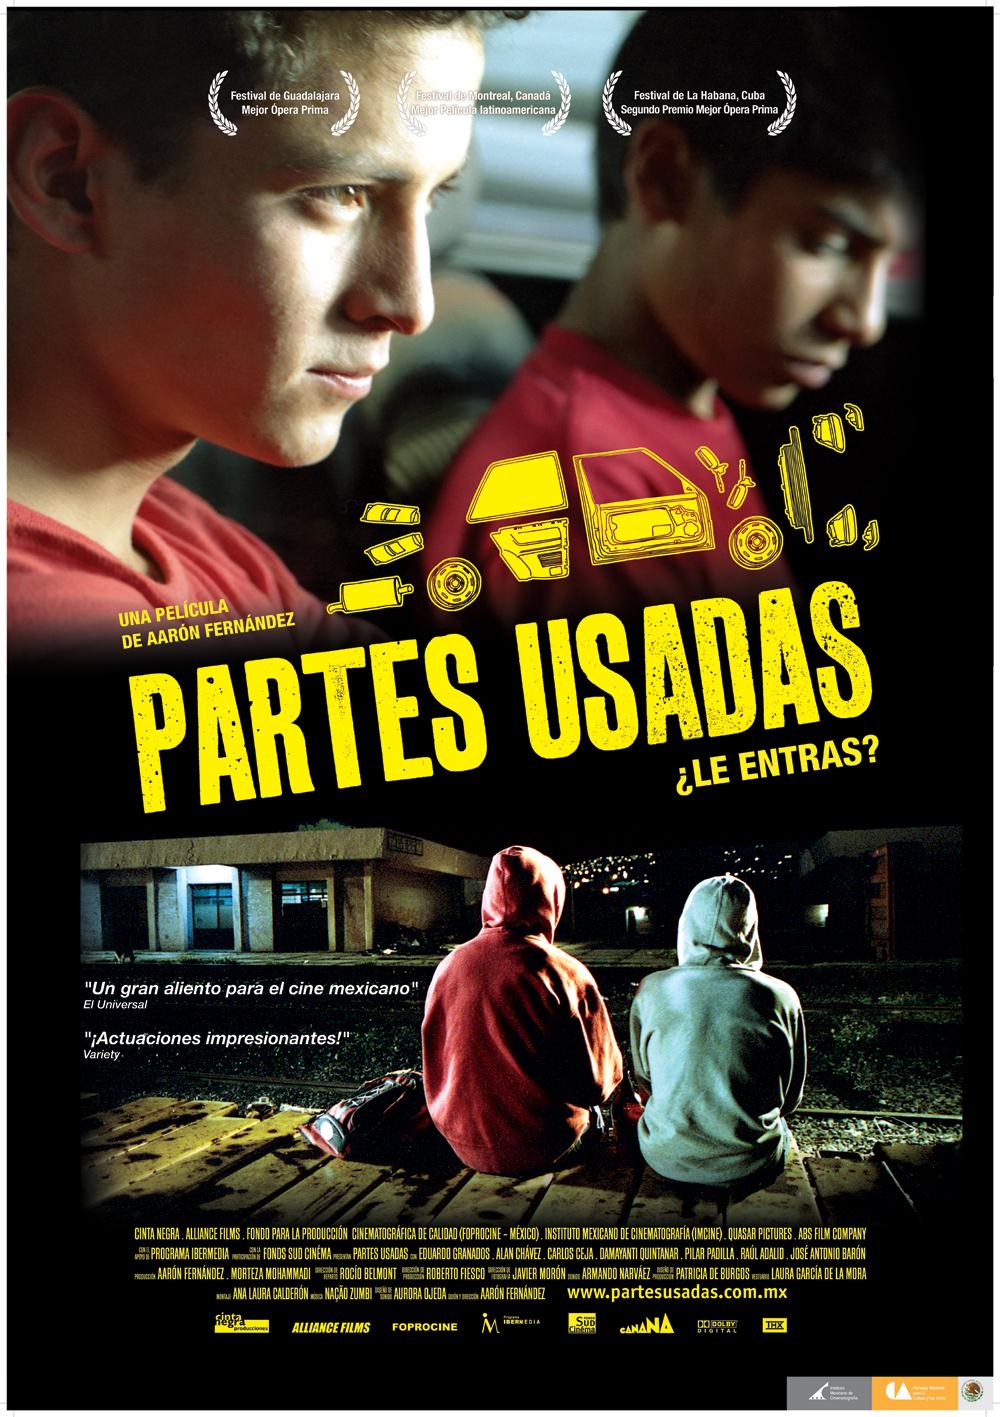 PARTES-USADA_POSTER.jpg